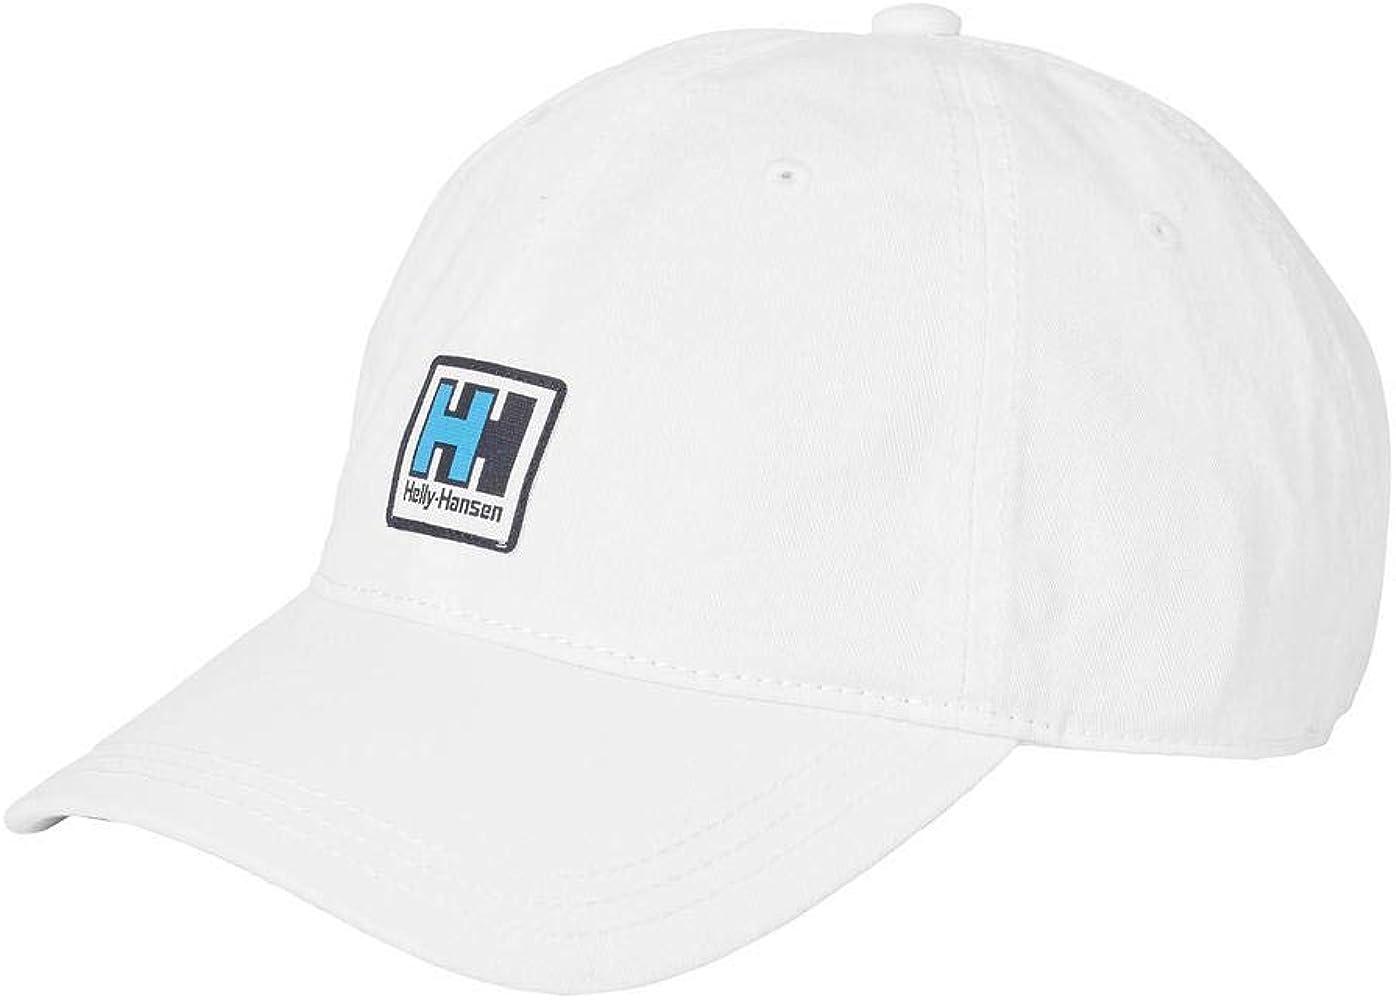 Helly Hansen HH Logo Gorra, Unisex Adulto, Blanco, Talla Única ...